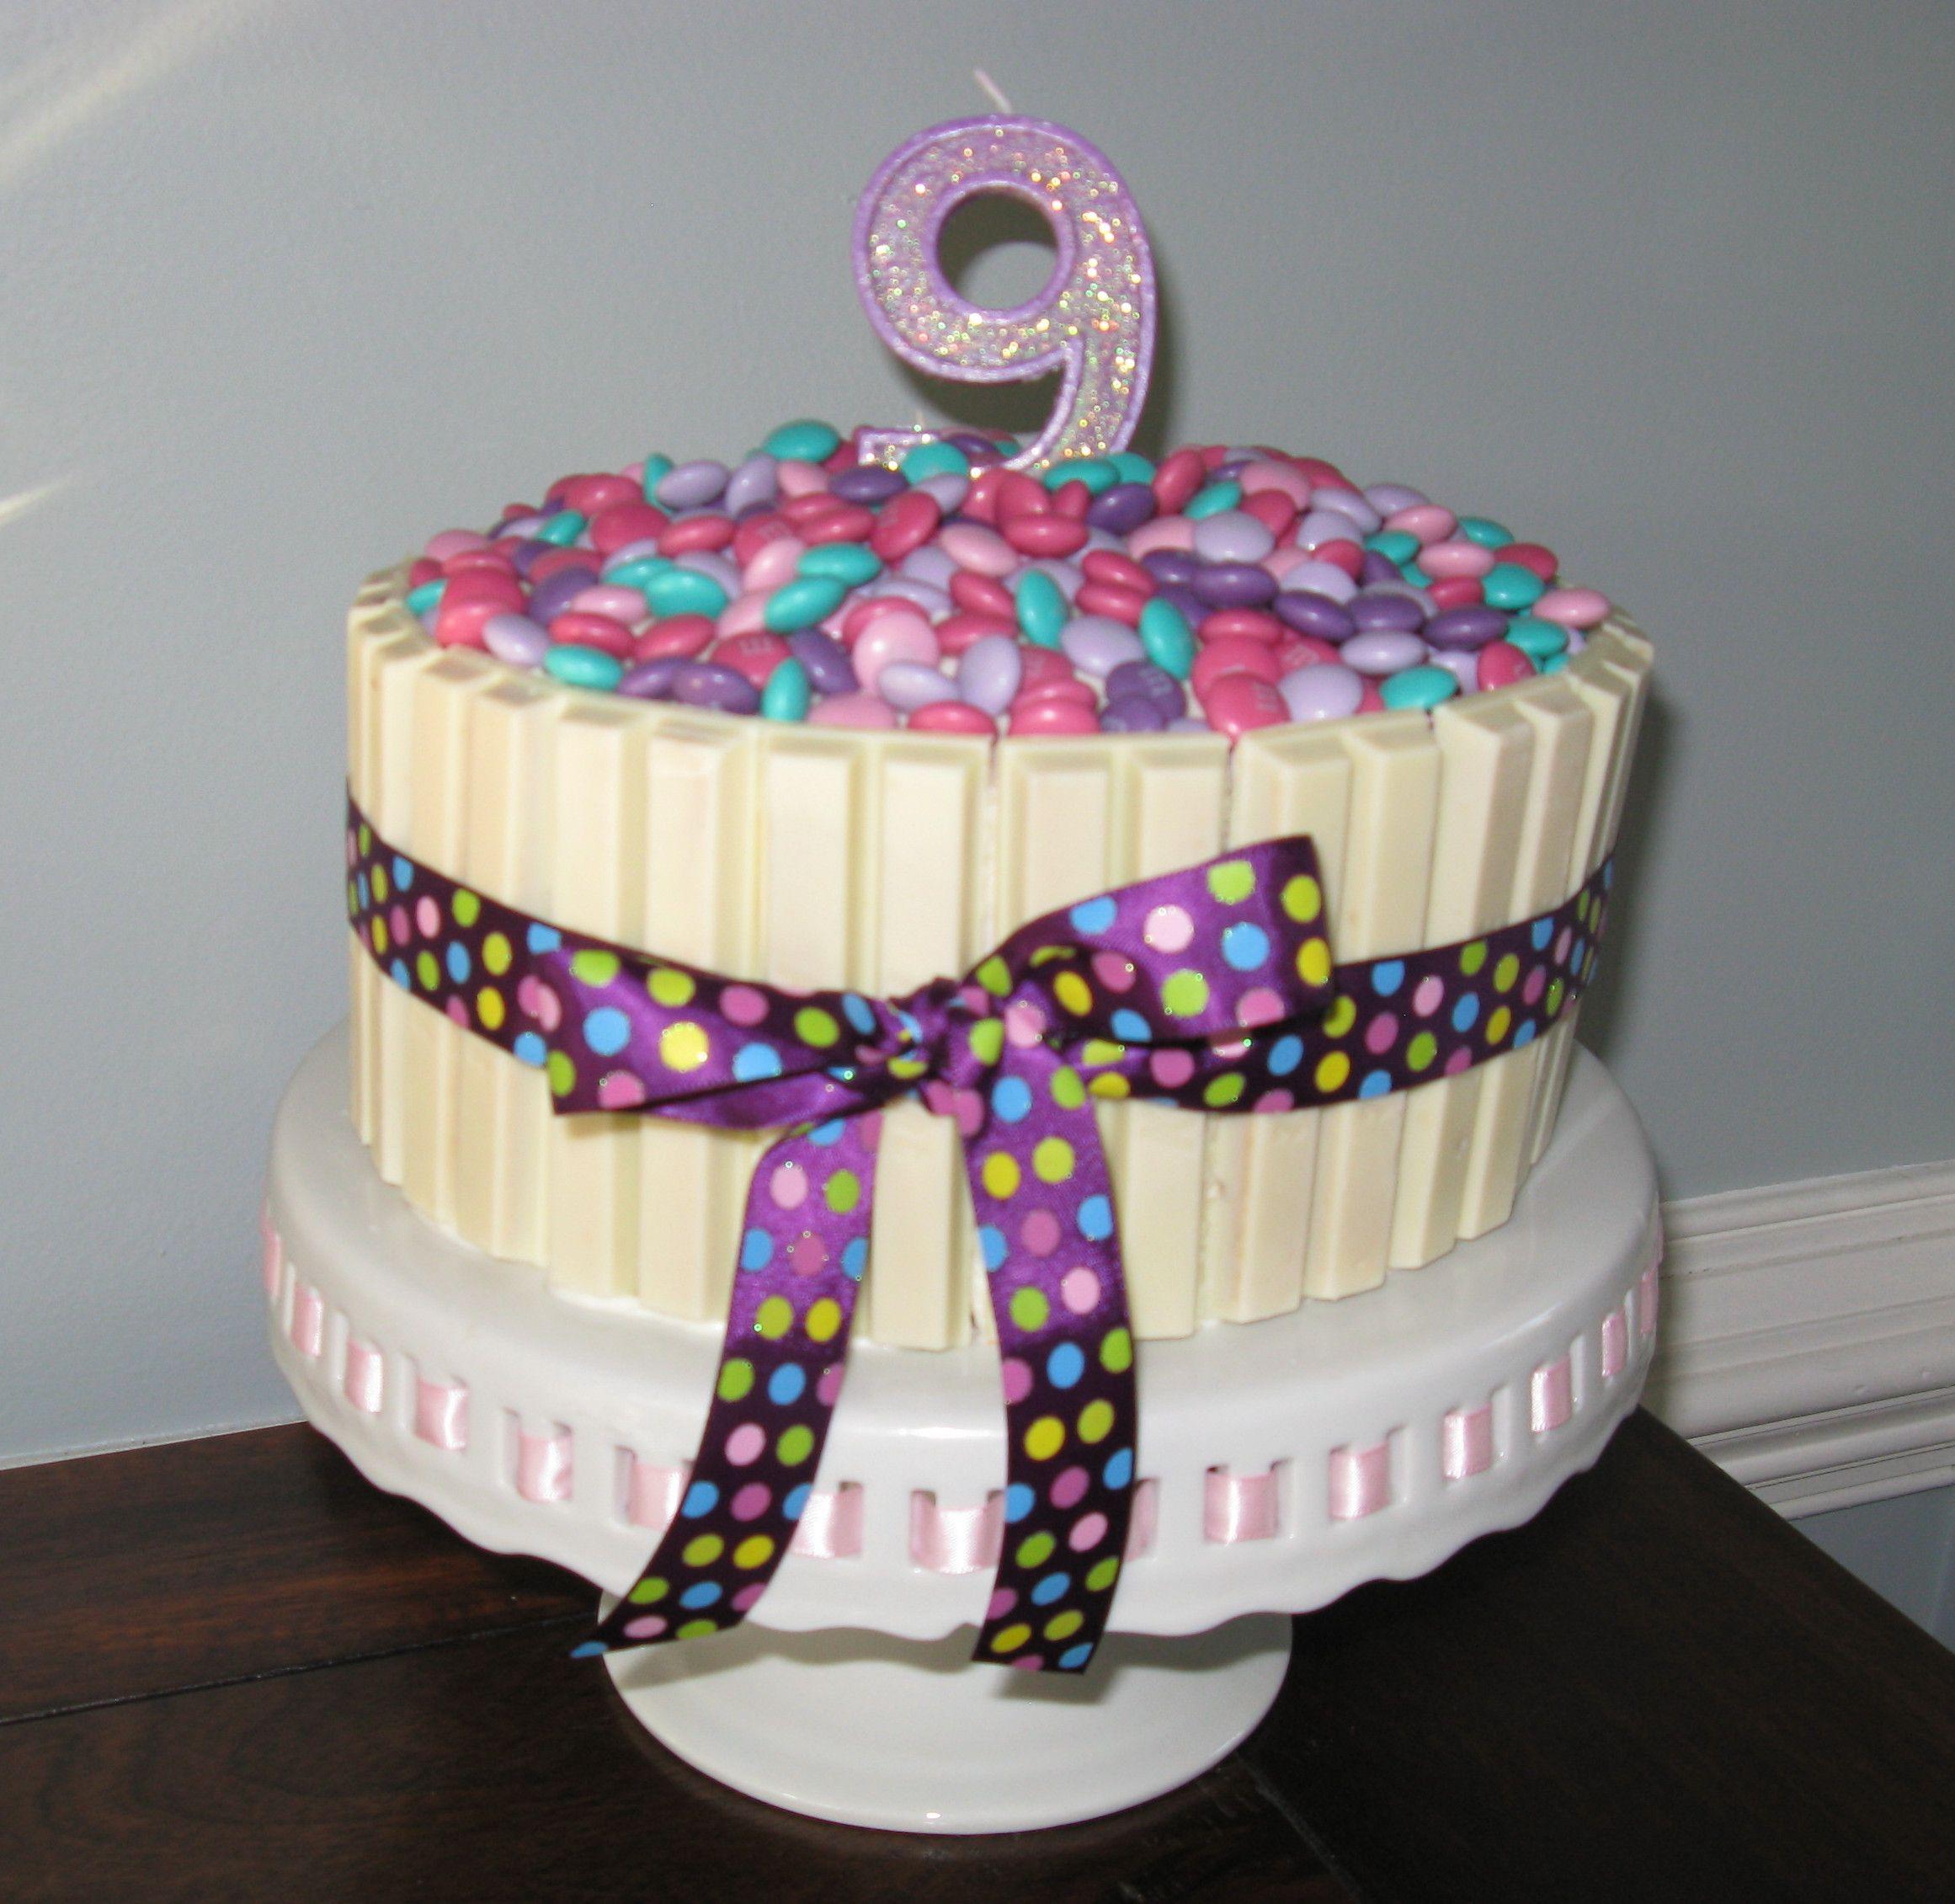 white kit kat cake add black liquorice pieces to make piano cake or